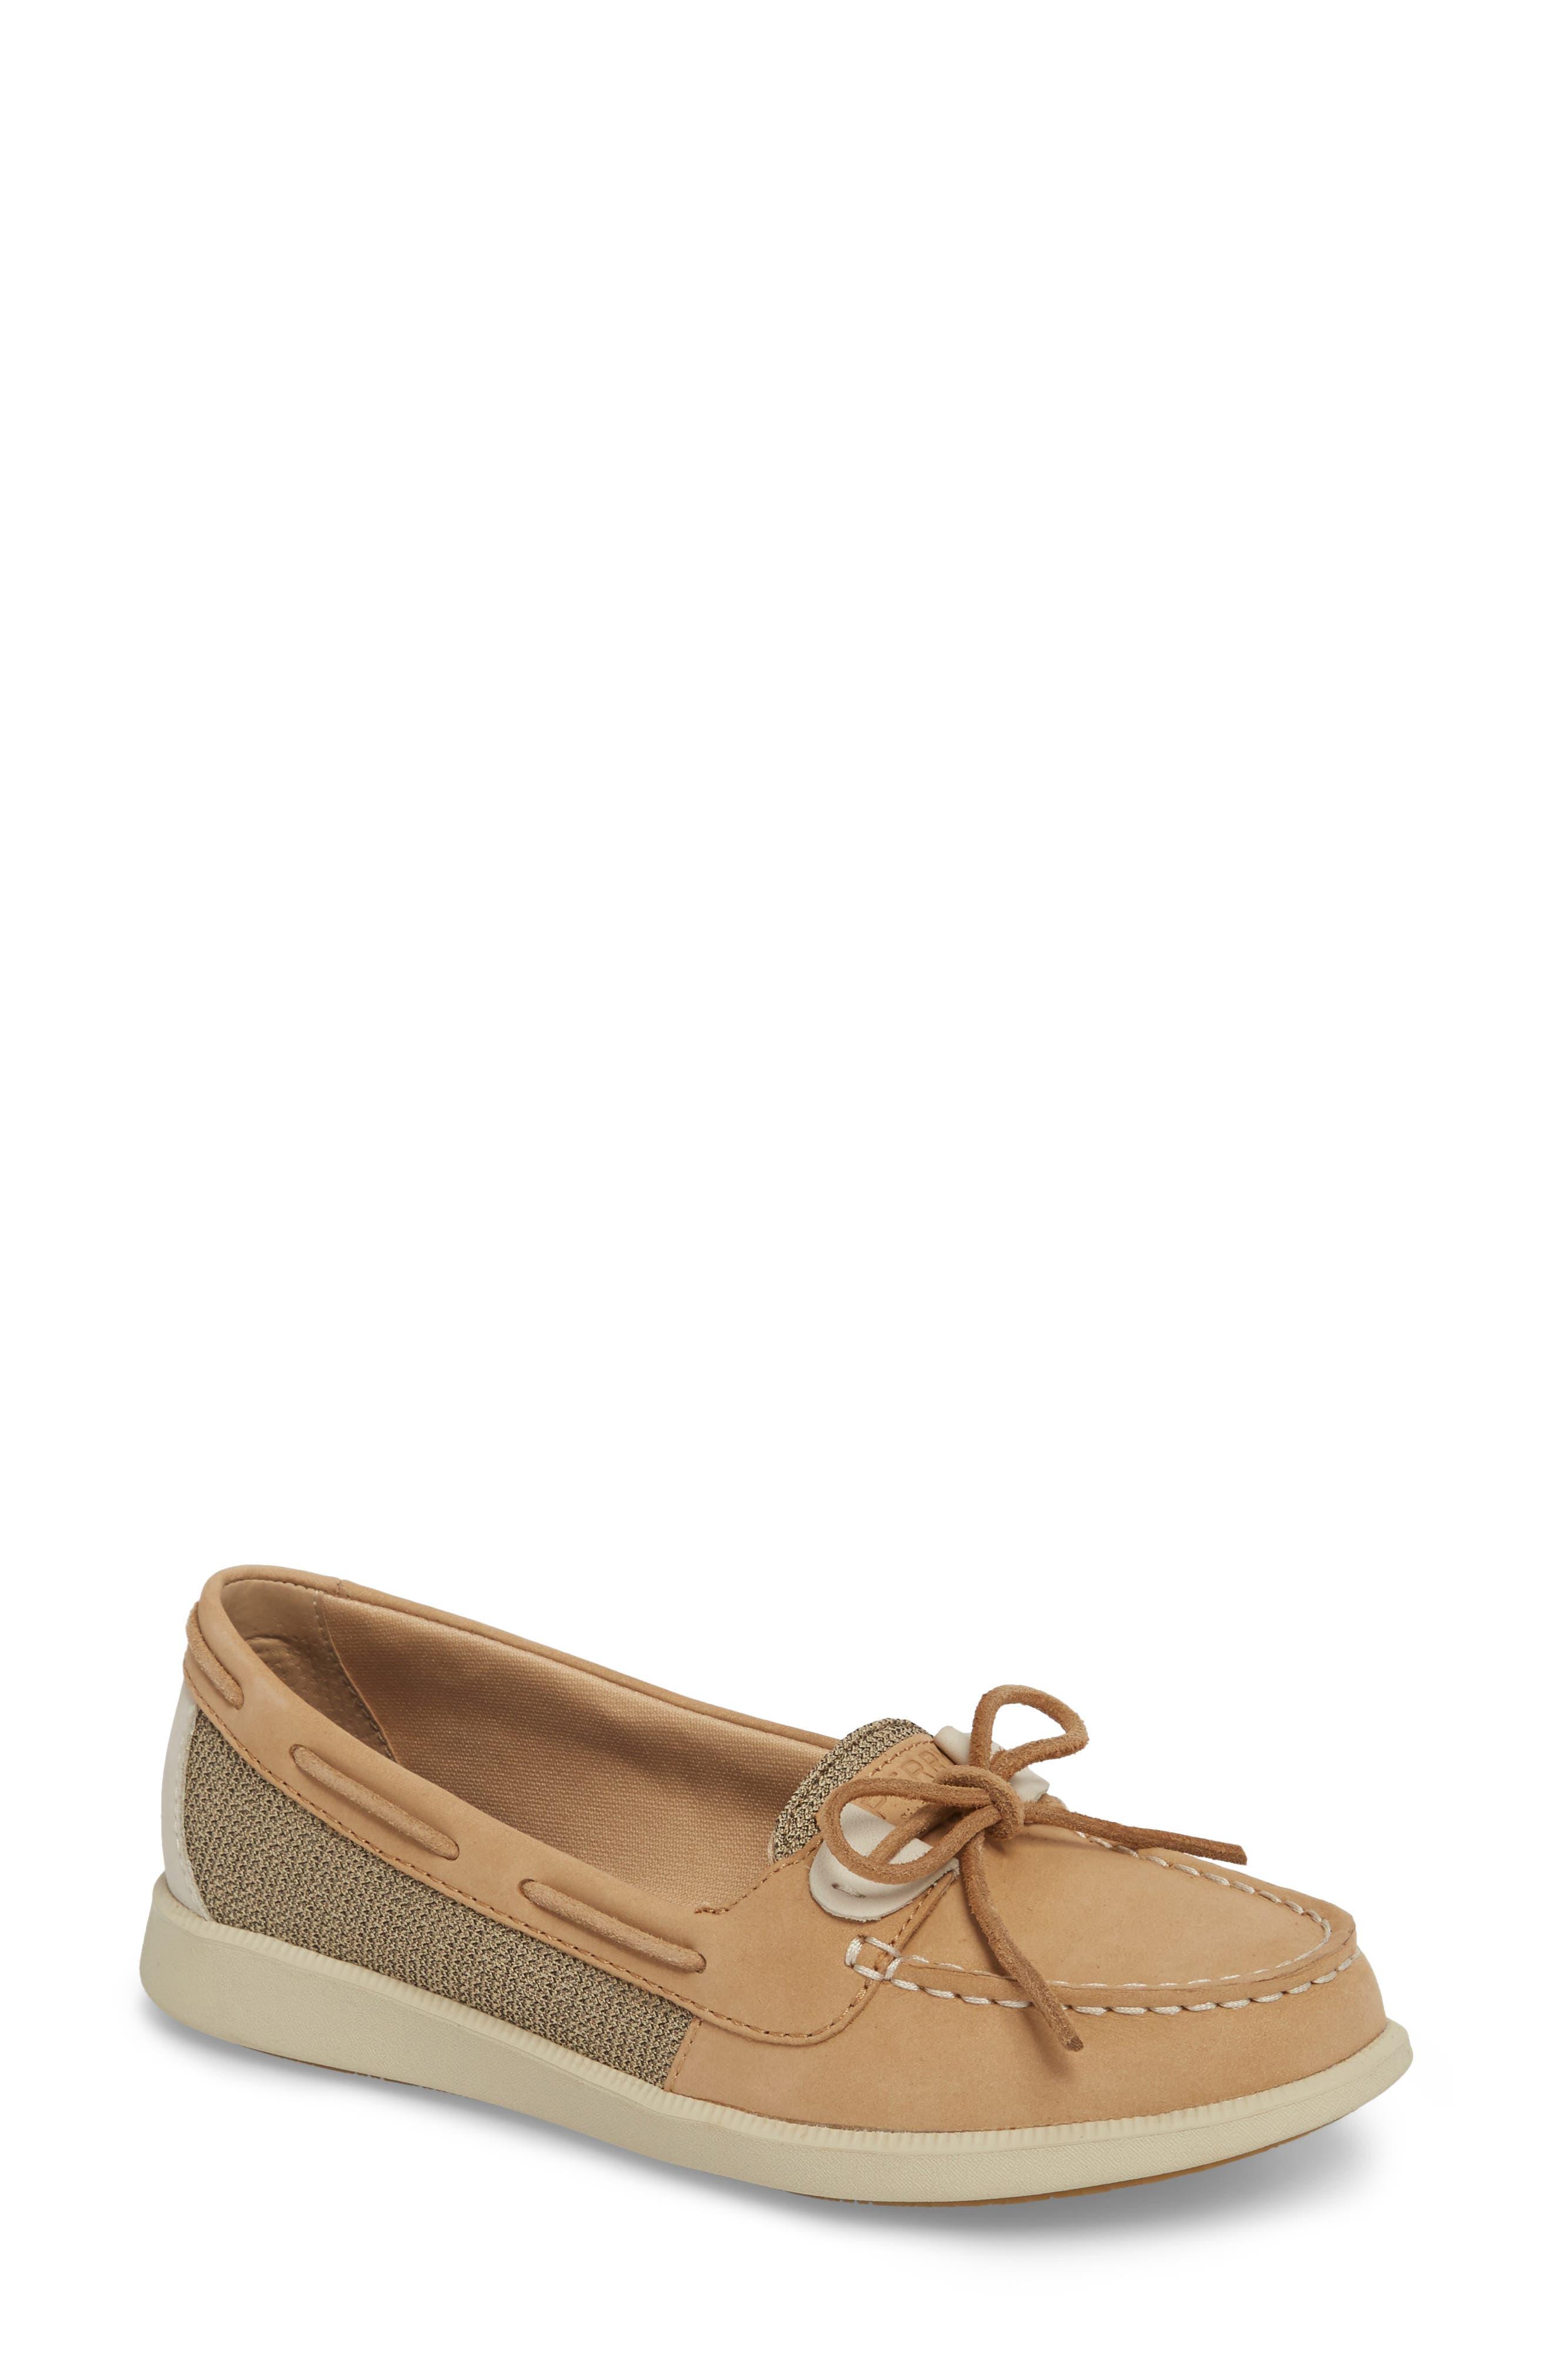 Oasis Boat Shoe,                         Main,                         color, LINEN OAT LEATHER